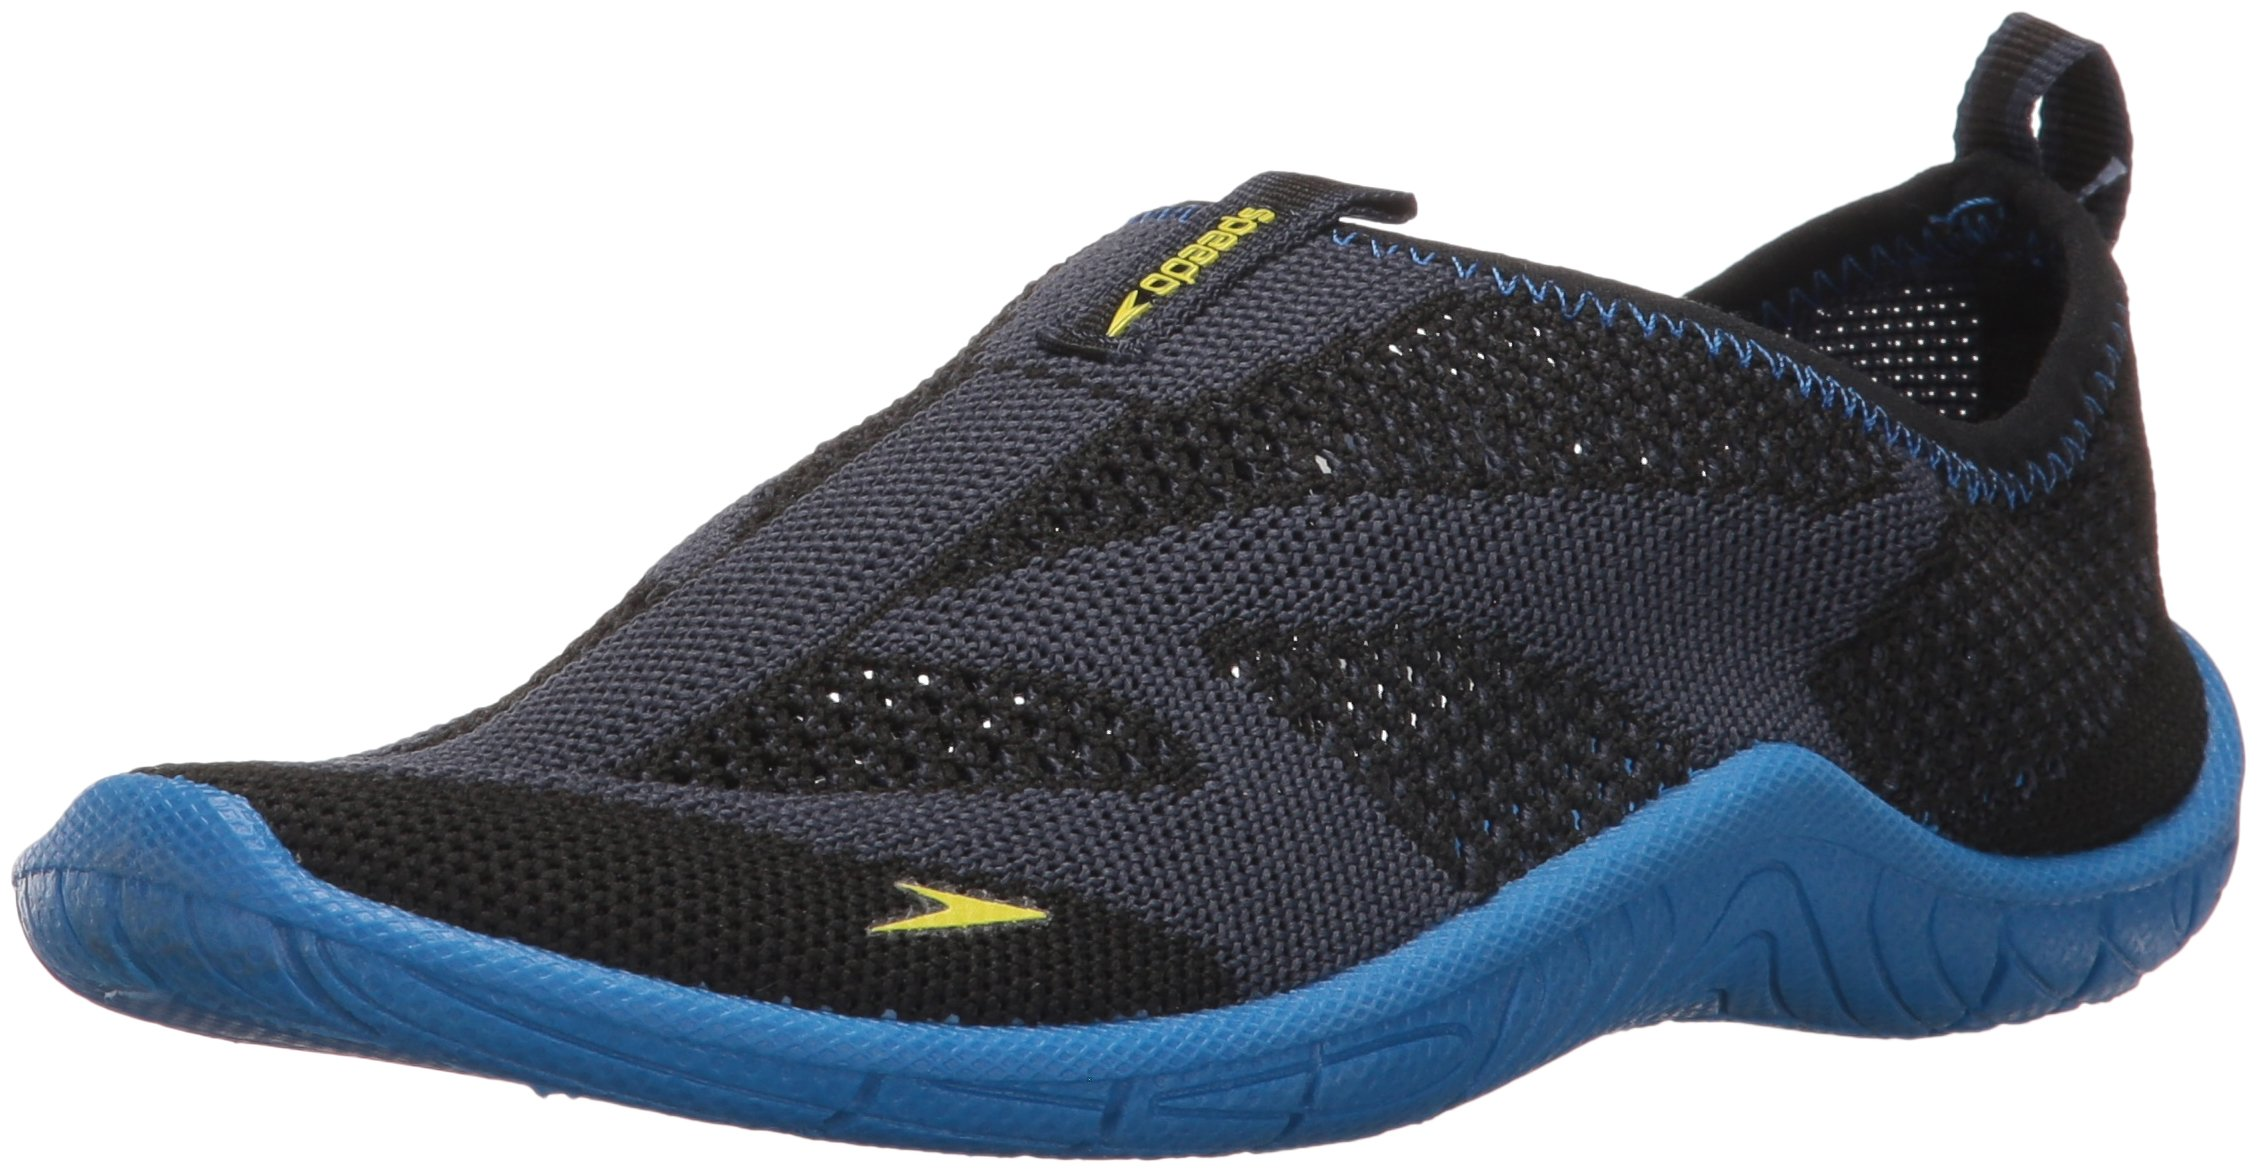 Speedo Kids' Surf Knit Athletic Water Skate Shoe, Navy/Blue, 1 D US Little Kid